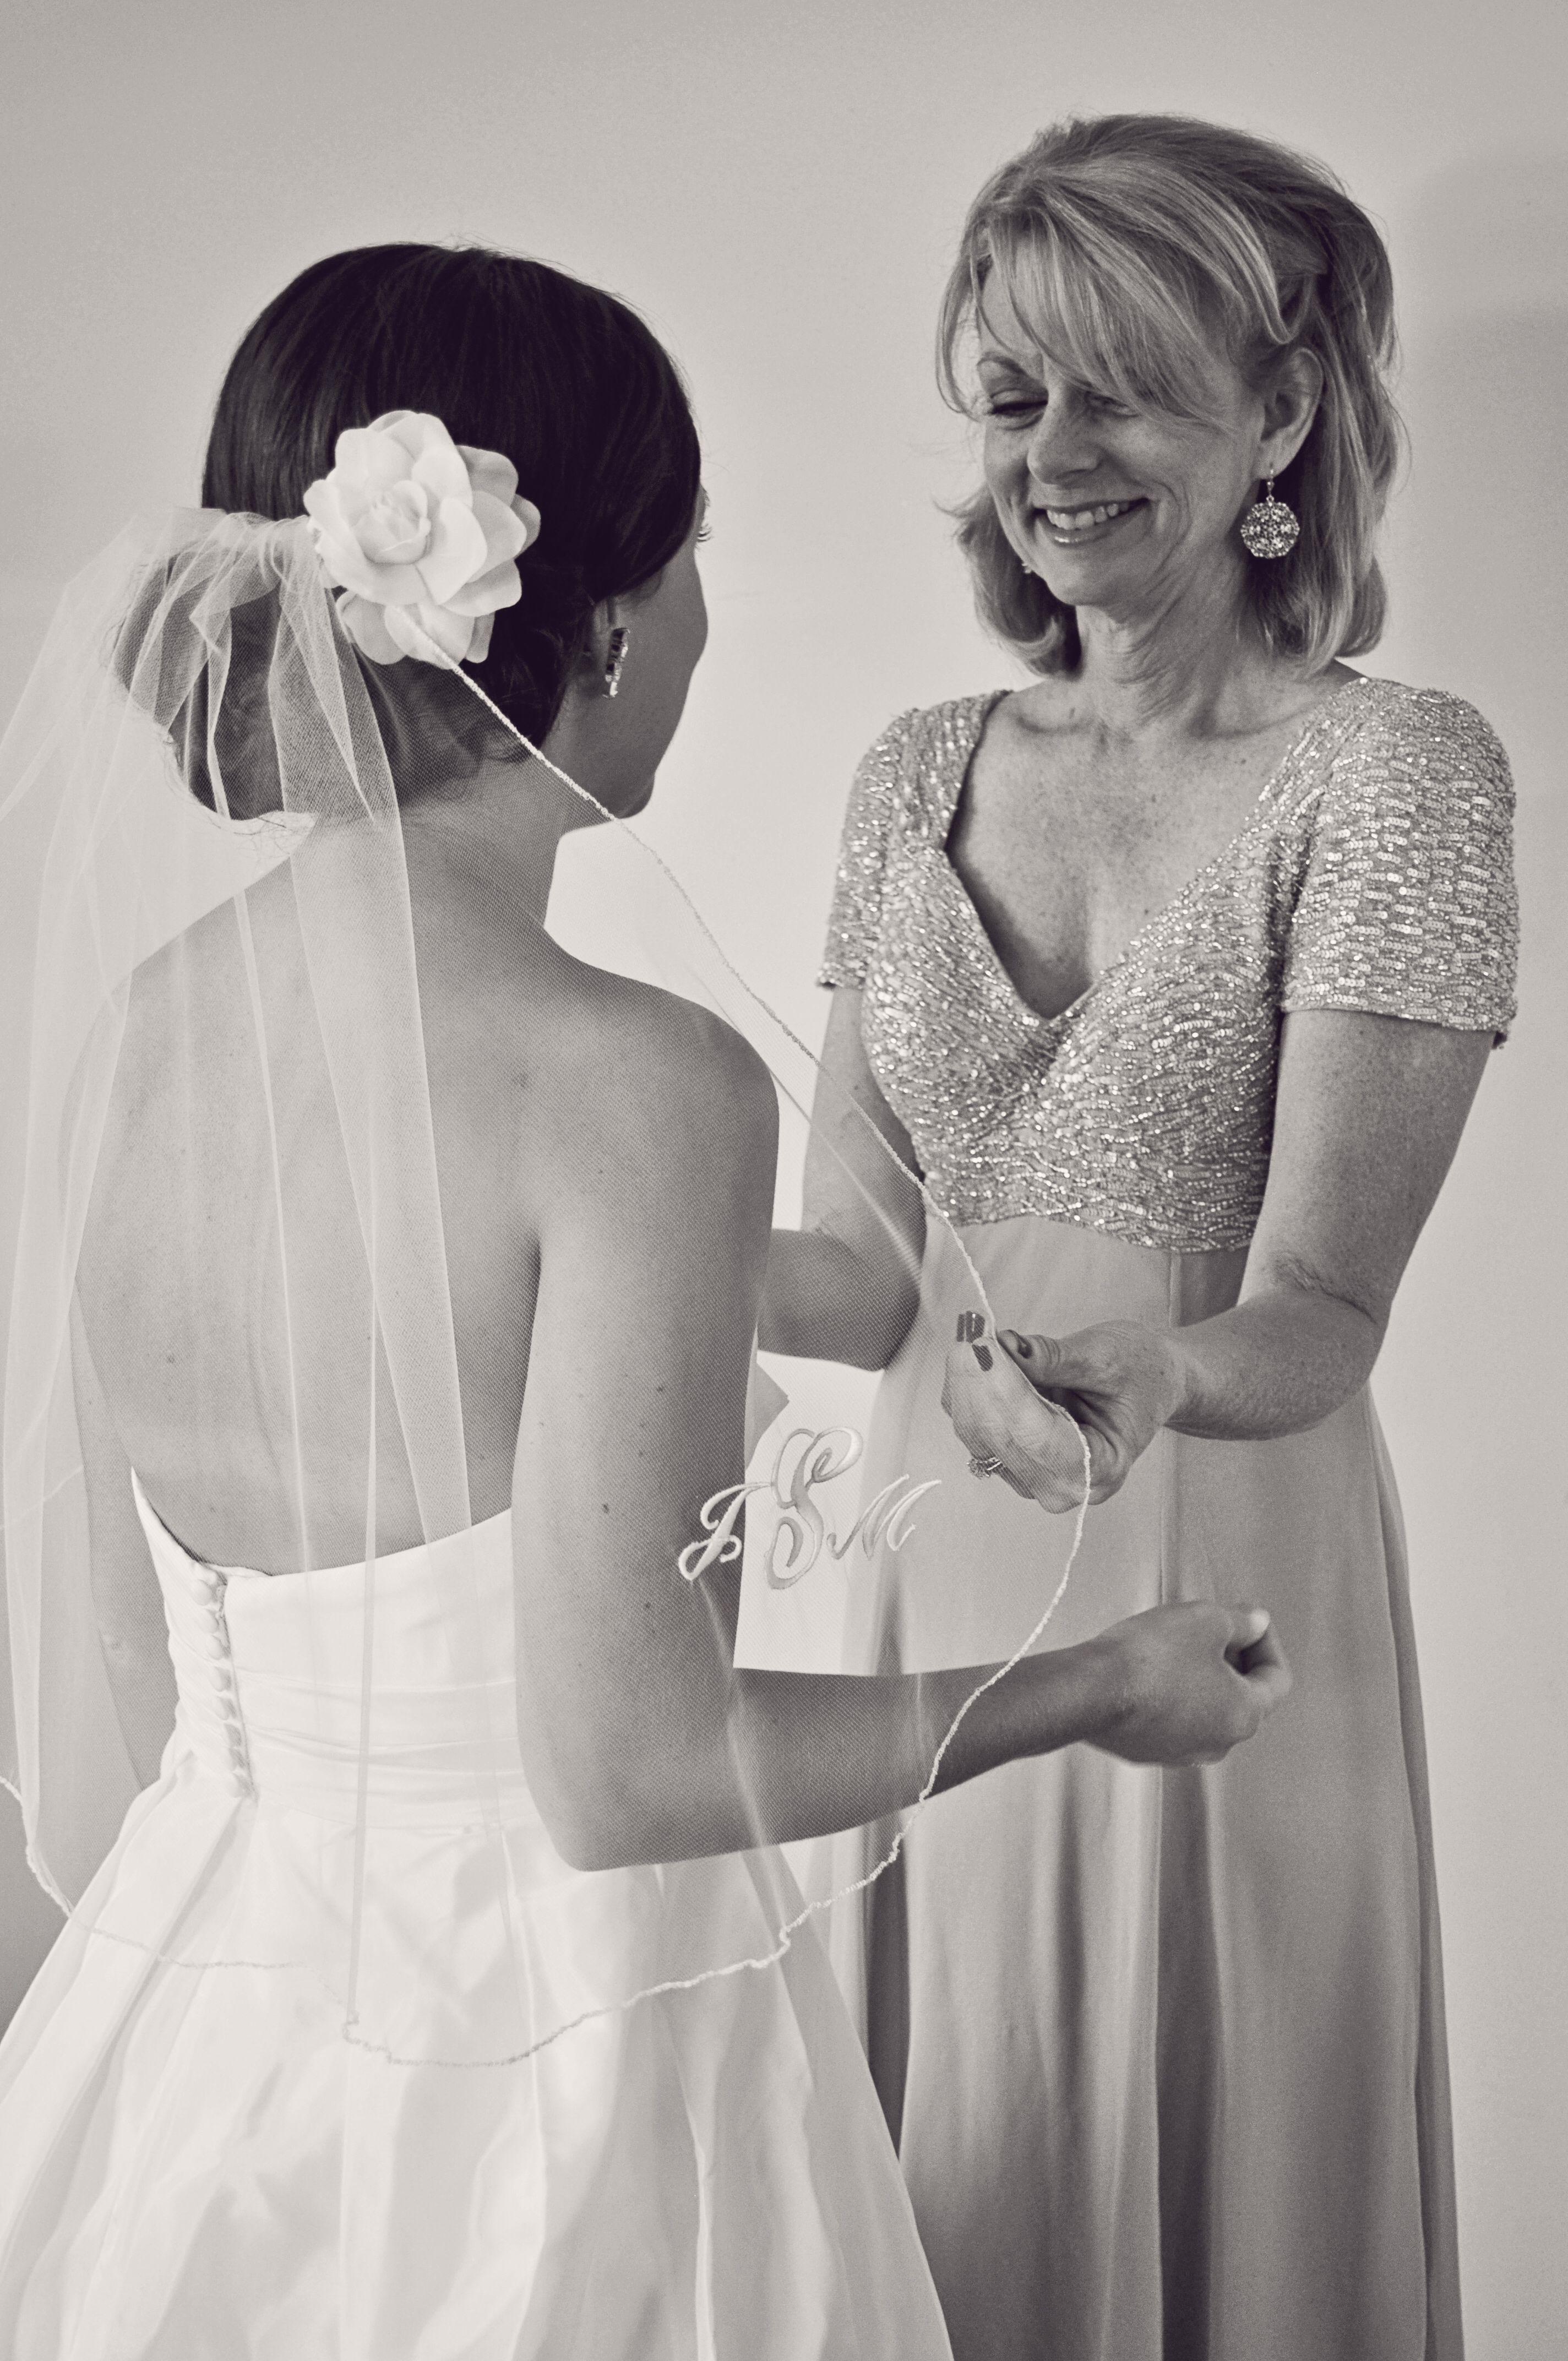 Bride & MOB wedding hairstyles | Wedding Hair Portfolio | Pinterest ...